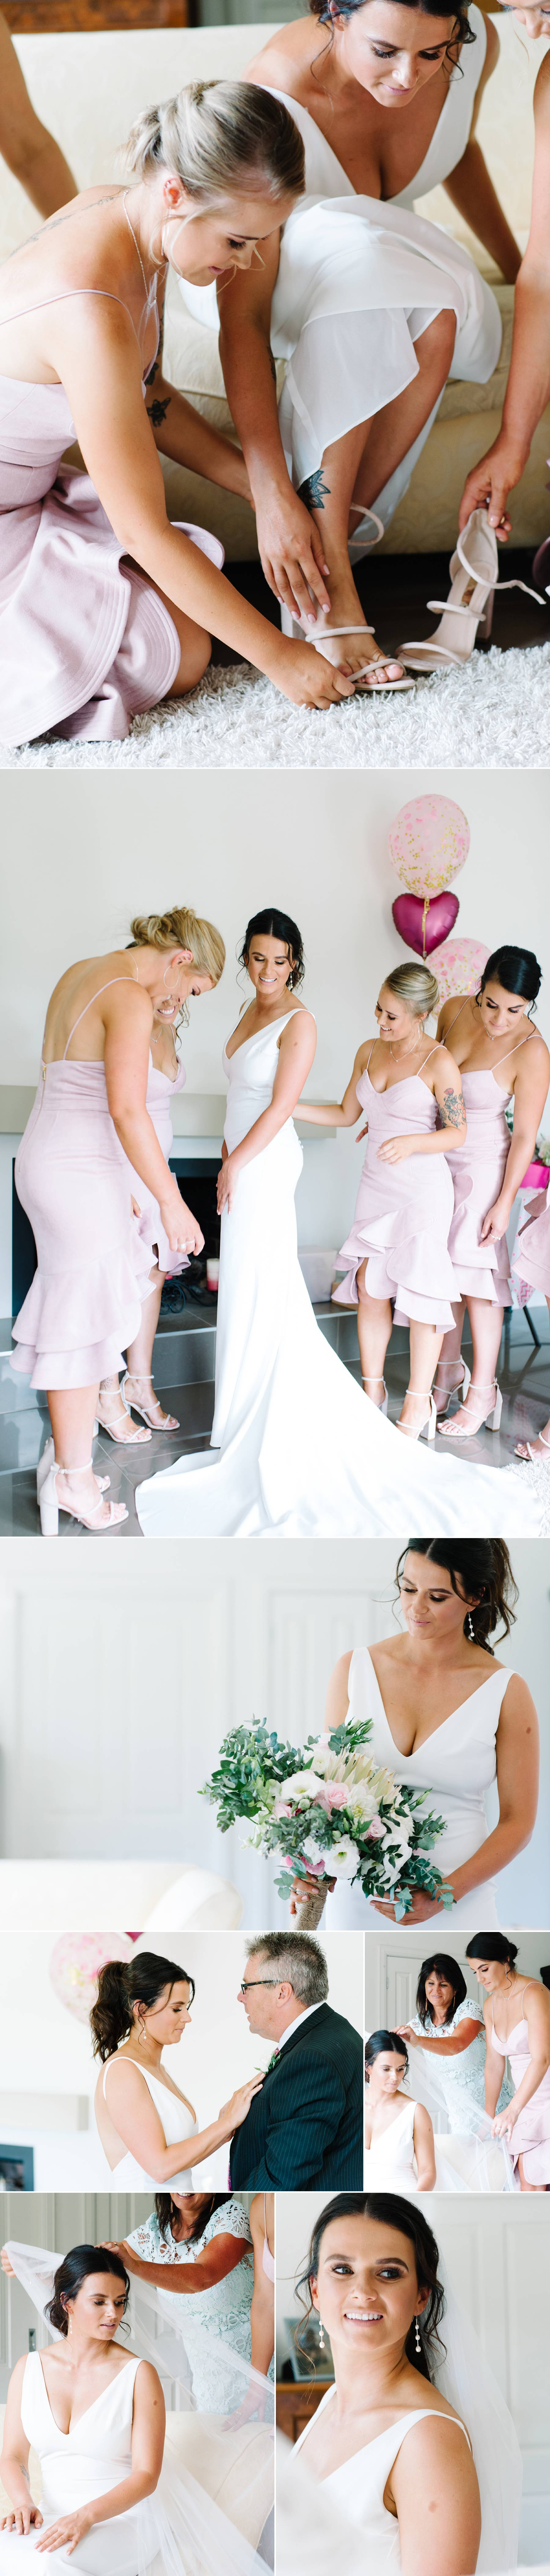 Bridesmaids by Mornington peninsula wedding photographer Michelle Pragt